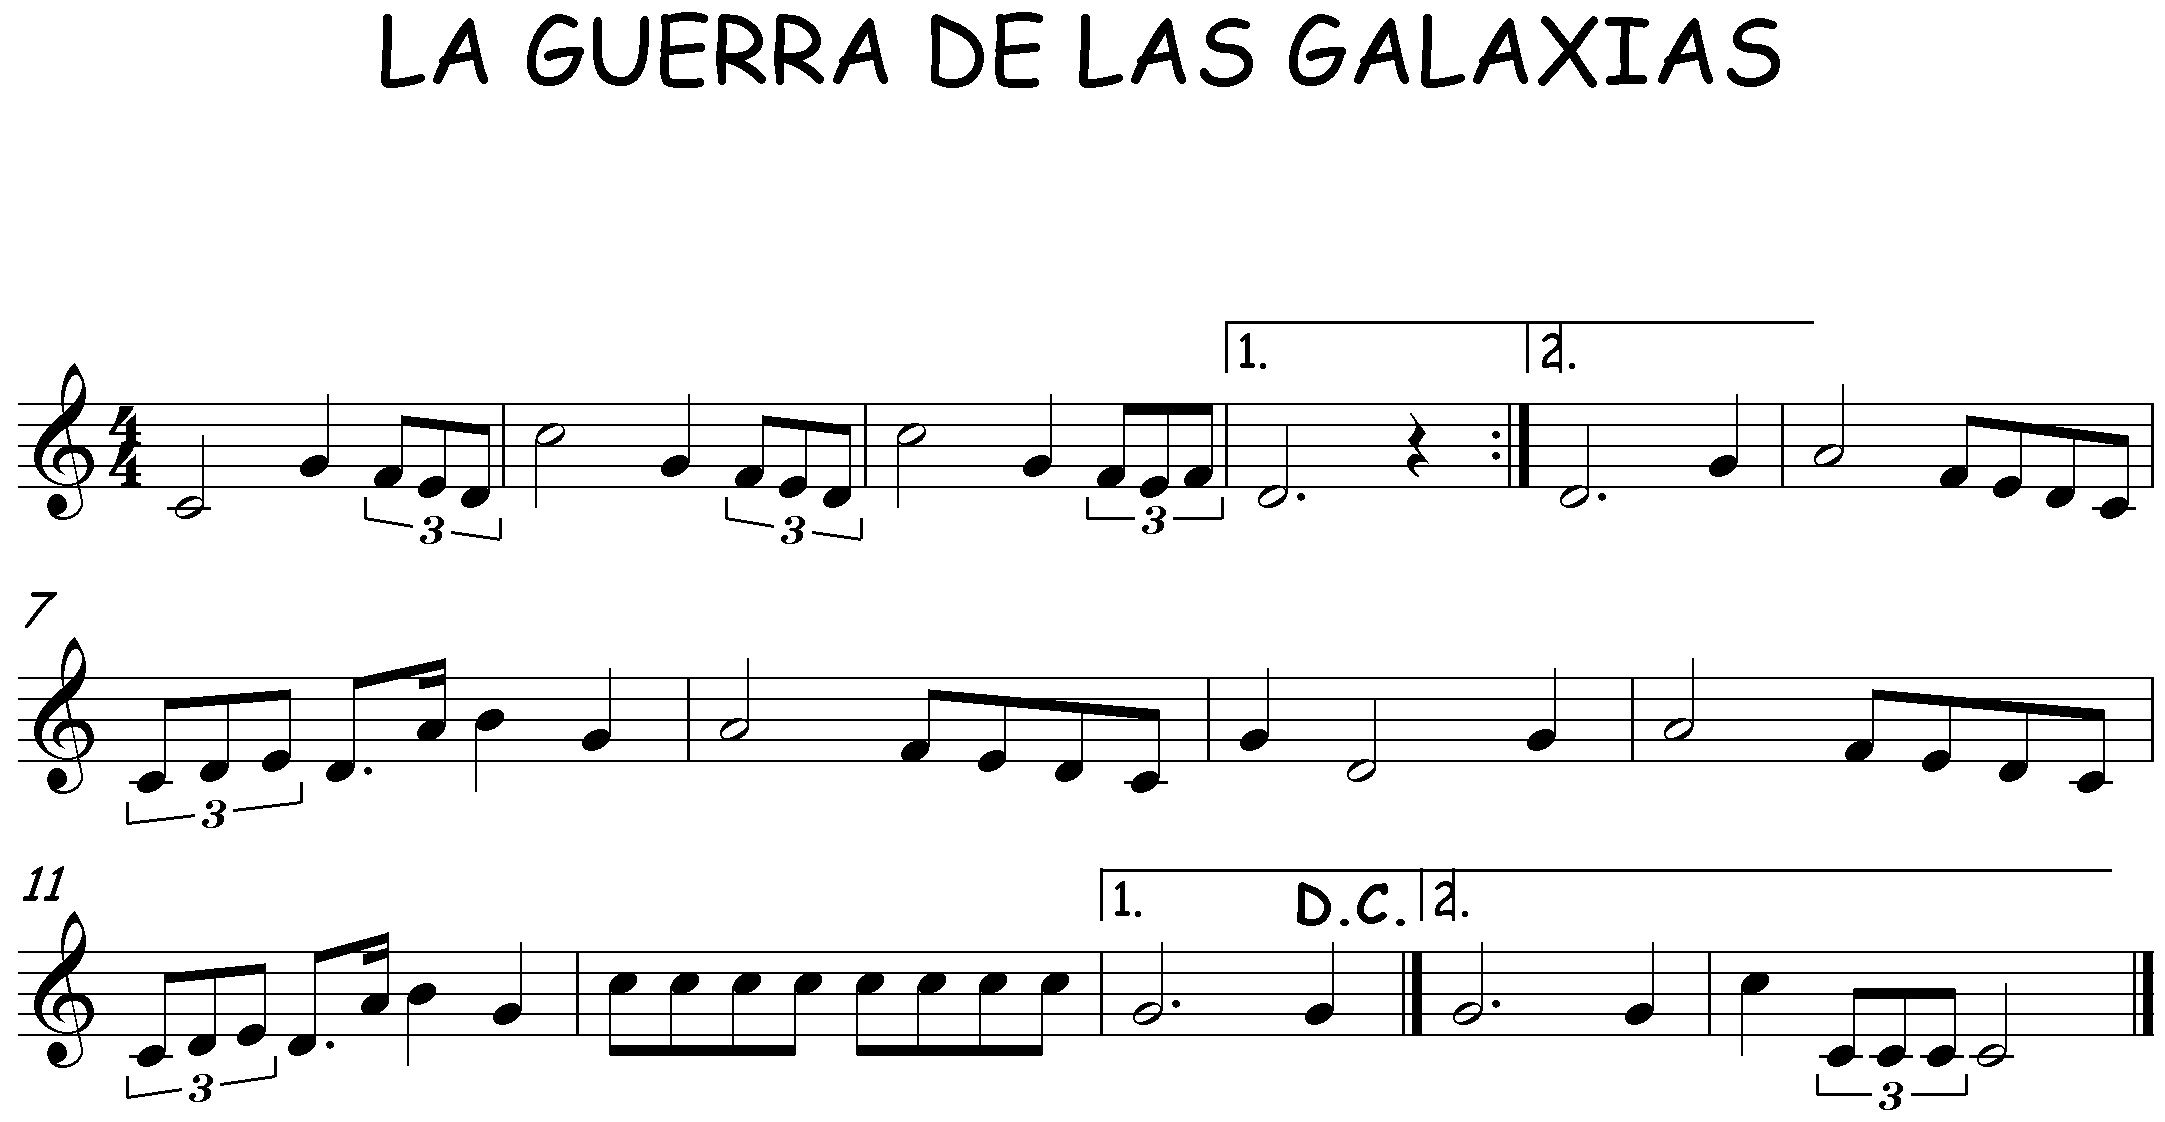 Partitura Titanic Para Flauta Dulce Buscar Con Google Partitura Flauta Partituras Educacion Musical